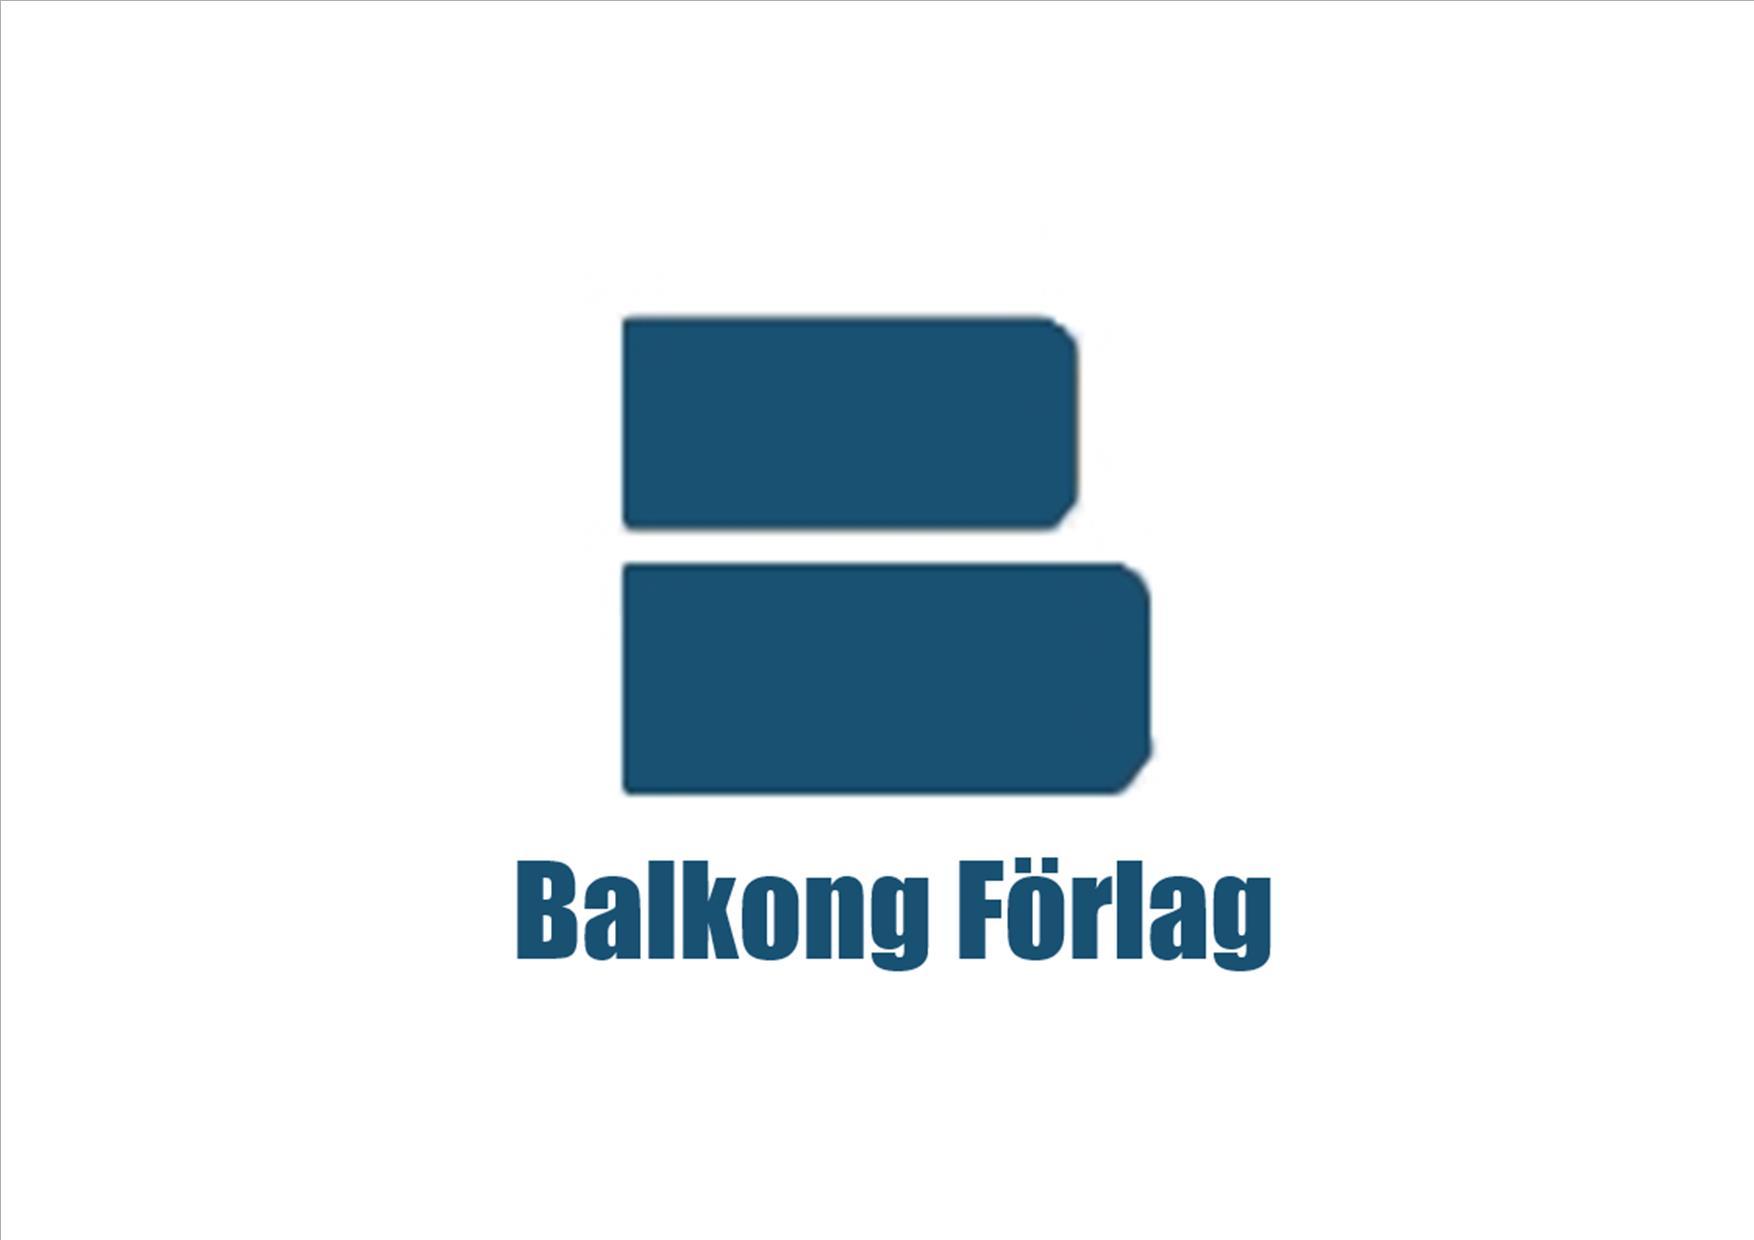 Balkong Förlag